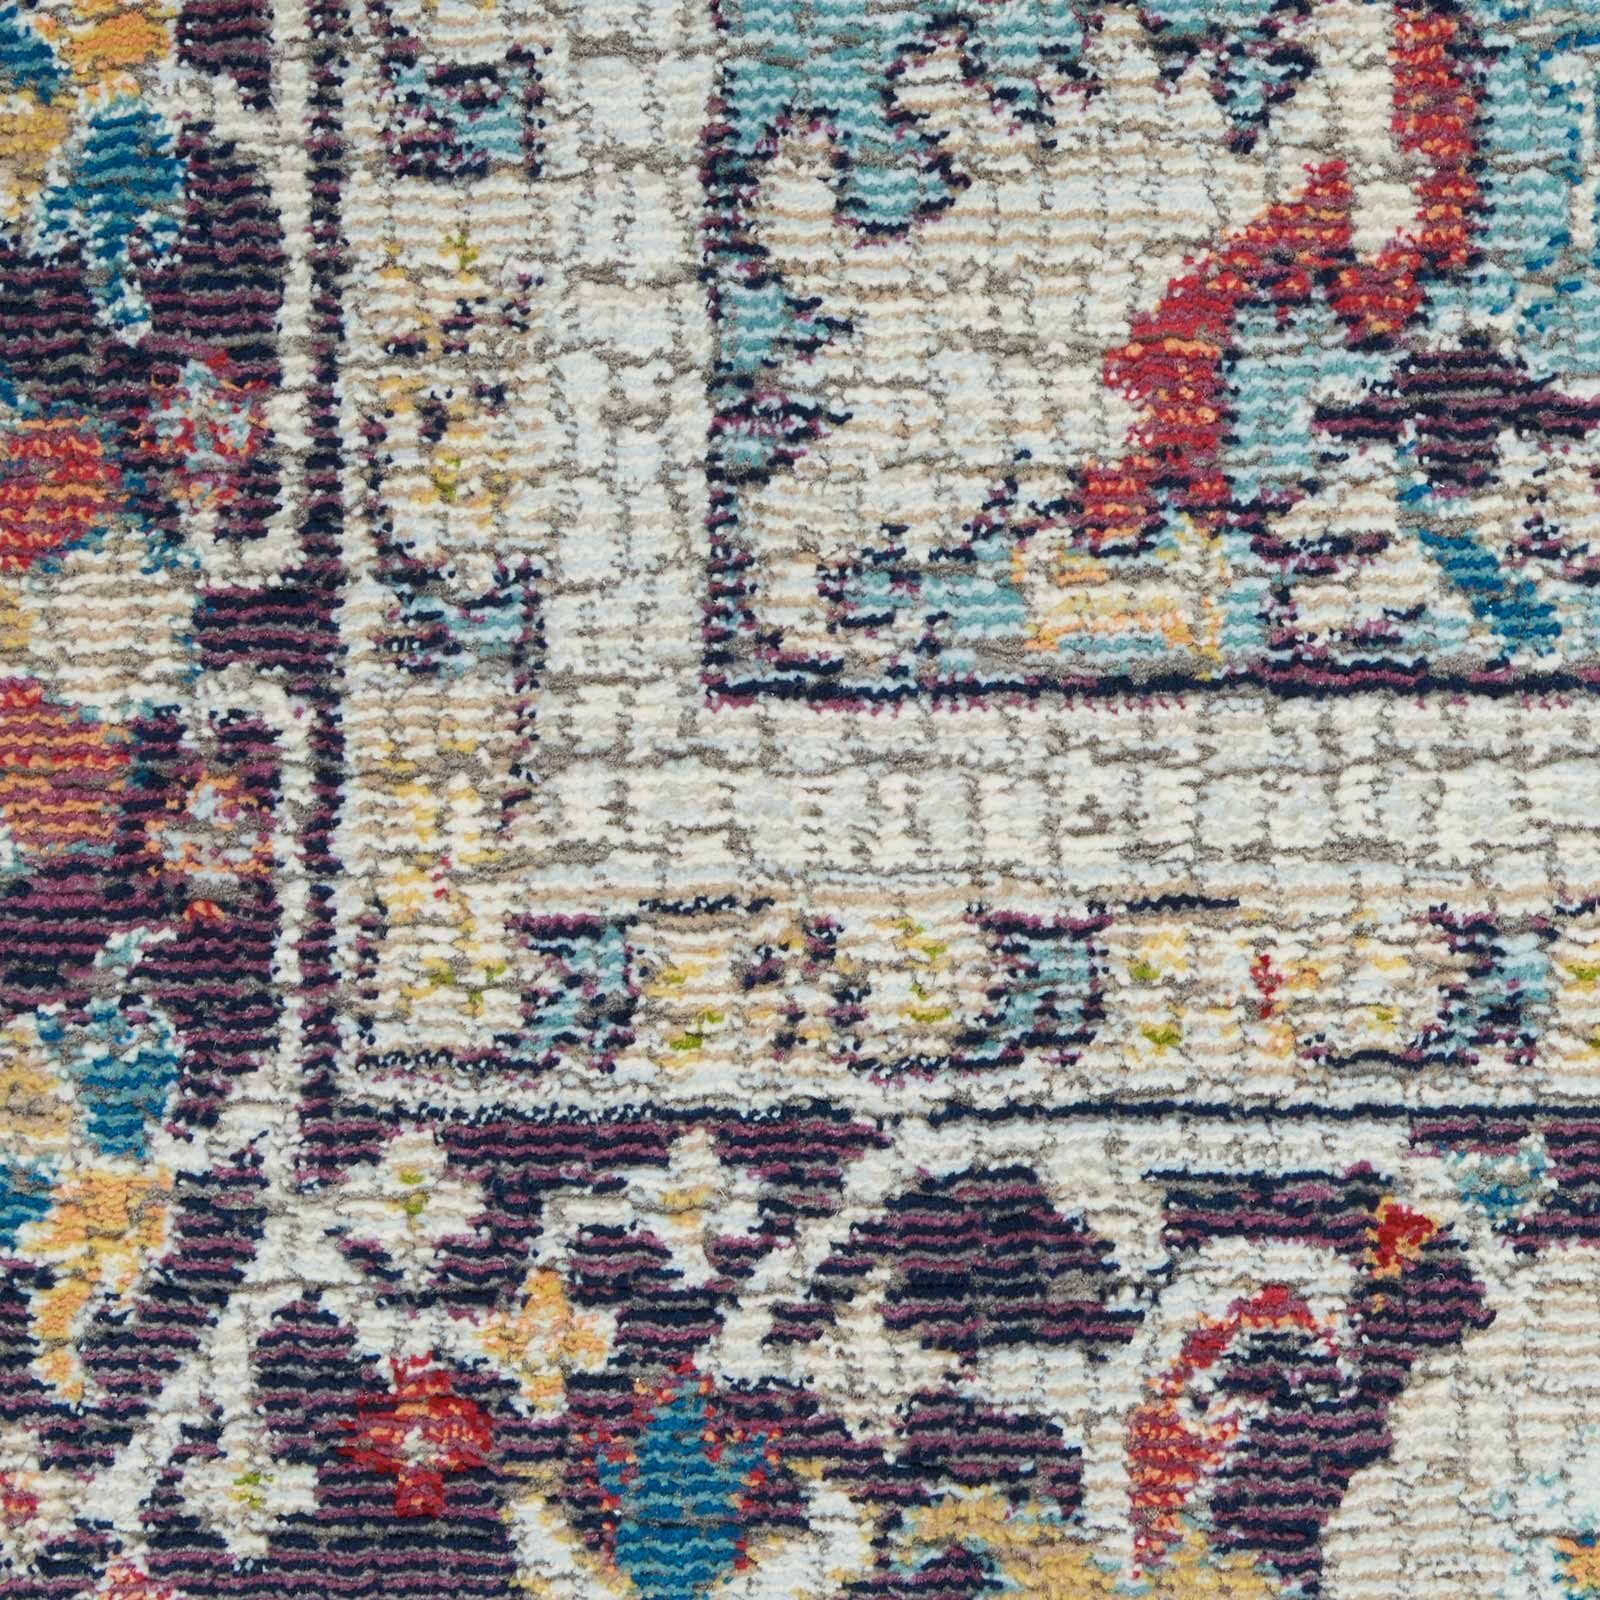 Nourison rug Ankara Global ANR14 TEAL MULTI 5x8 099446498441 swatch C